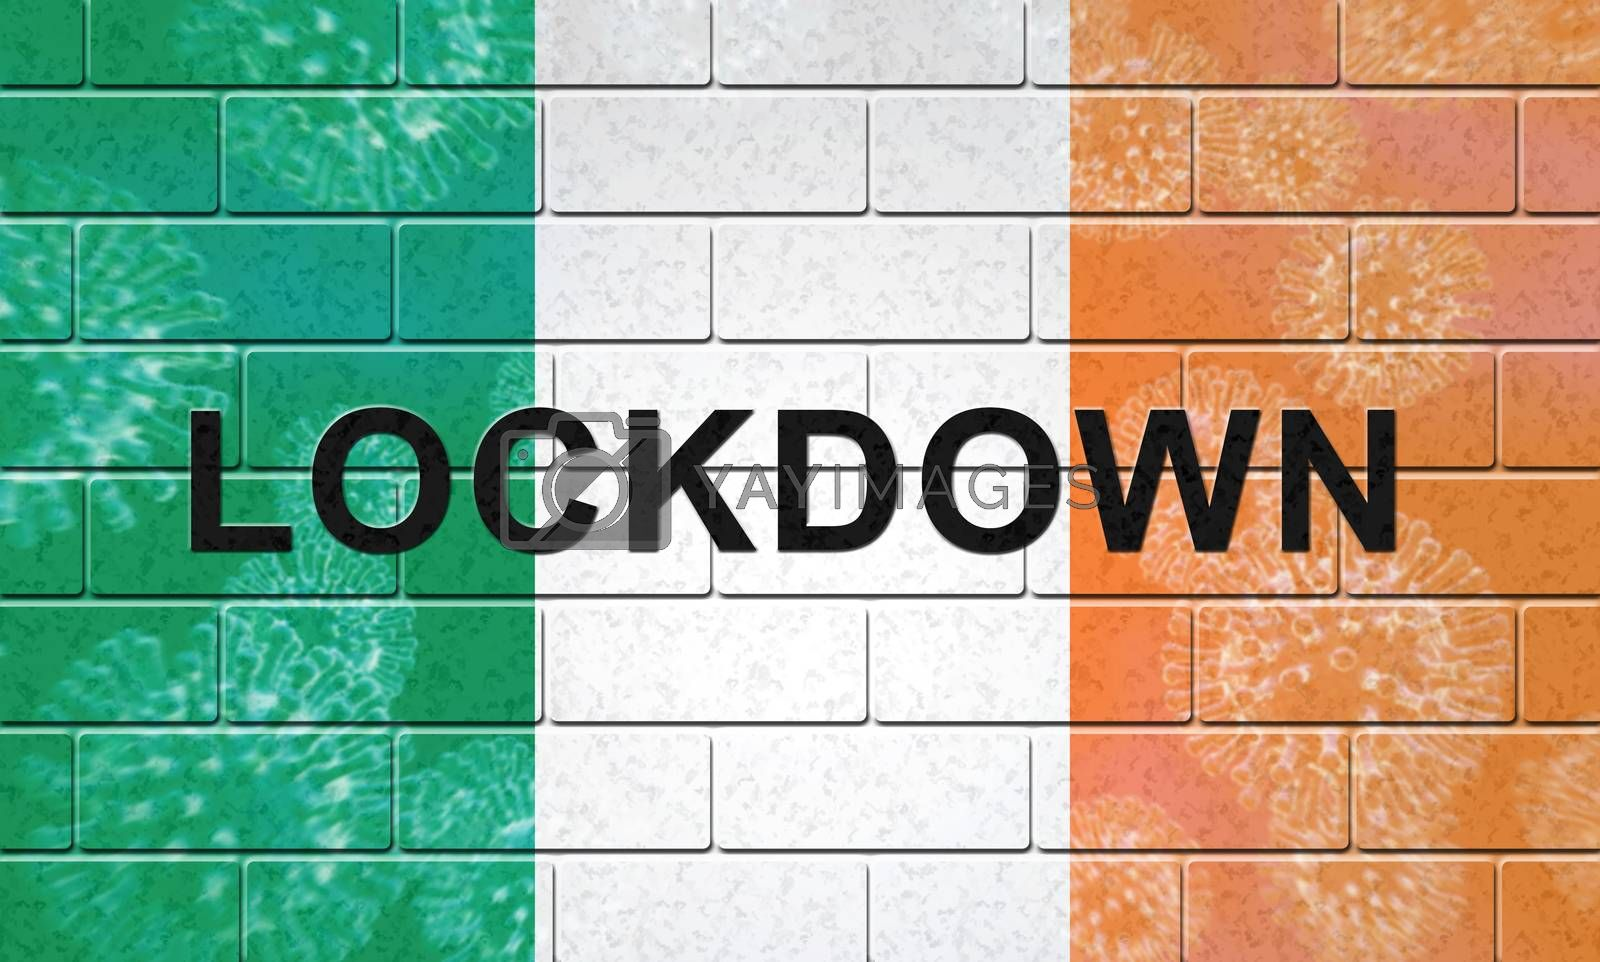 Ireland lockdown or curfew to stop covid19 epidemic - 3d Illustr by stuartmiles